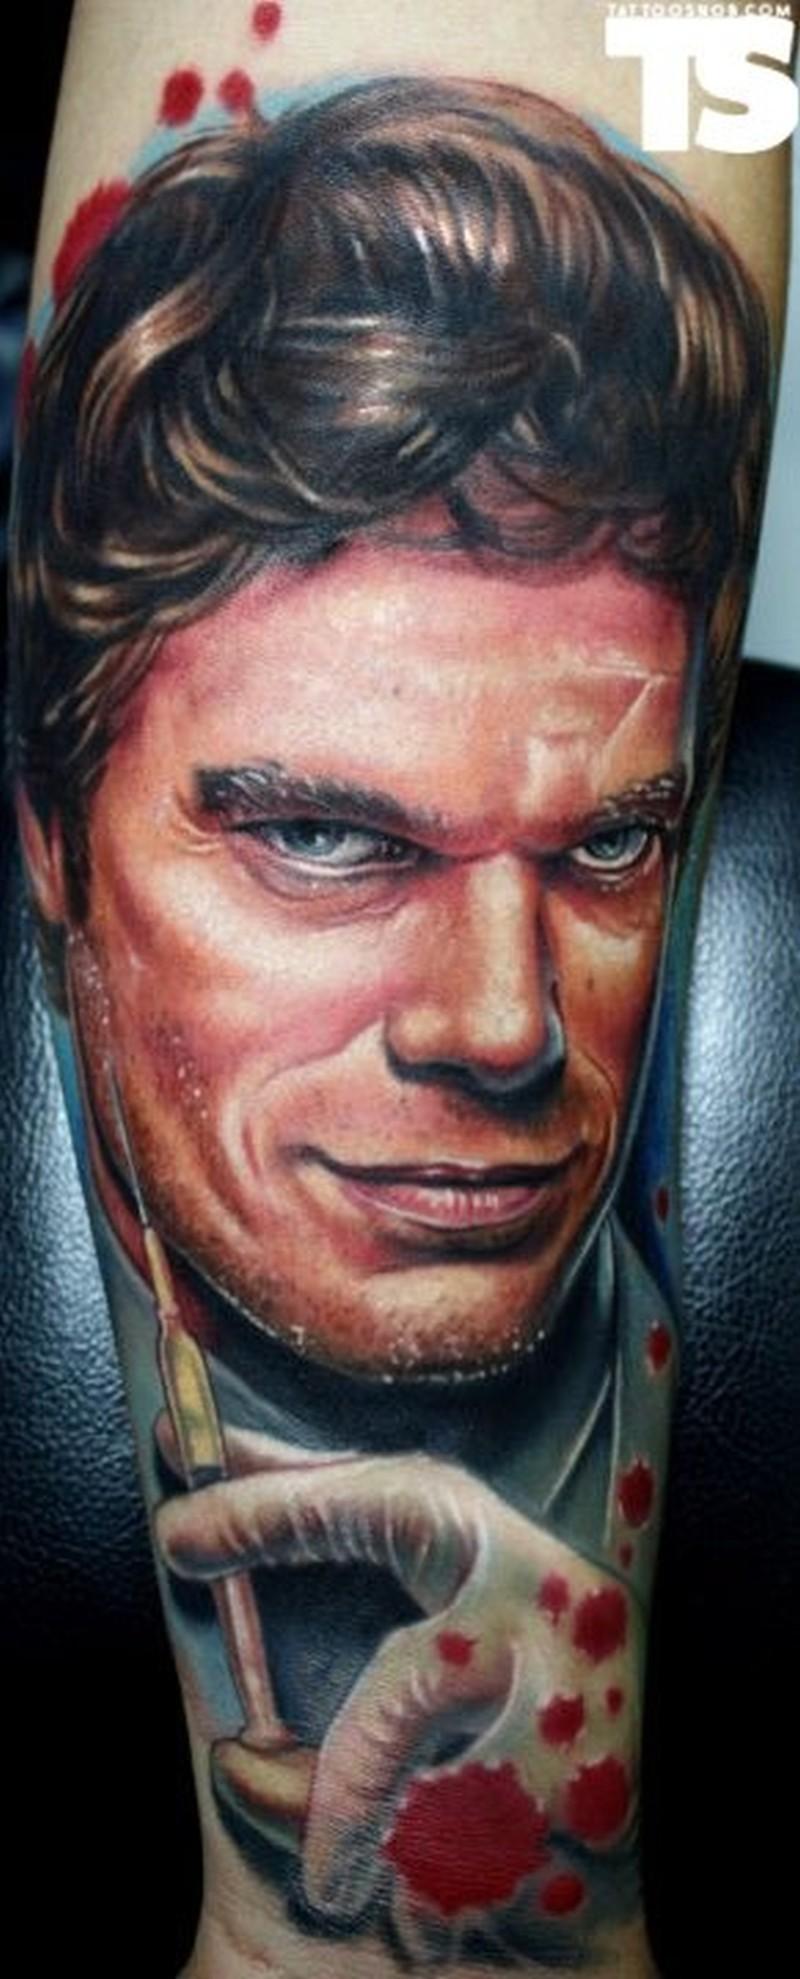 Dexter movie tattoo by paul acker